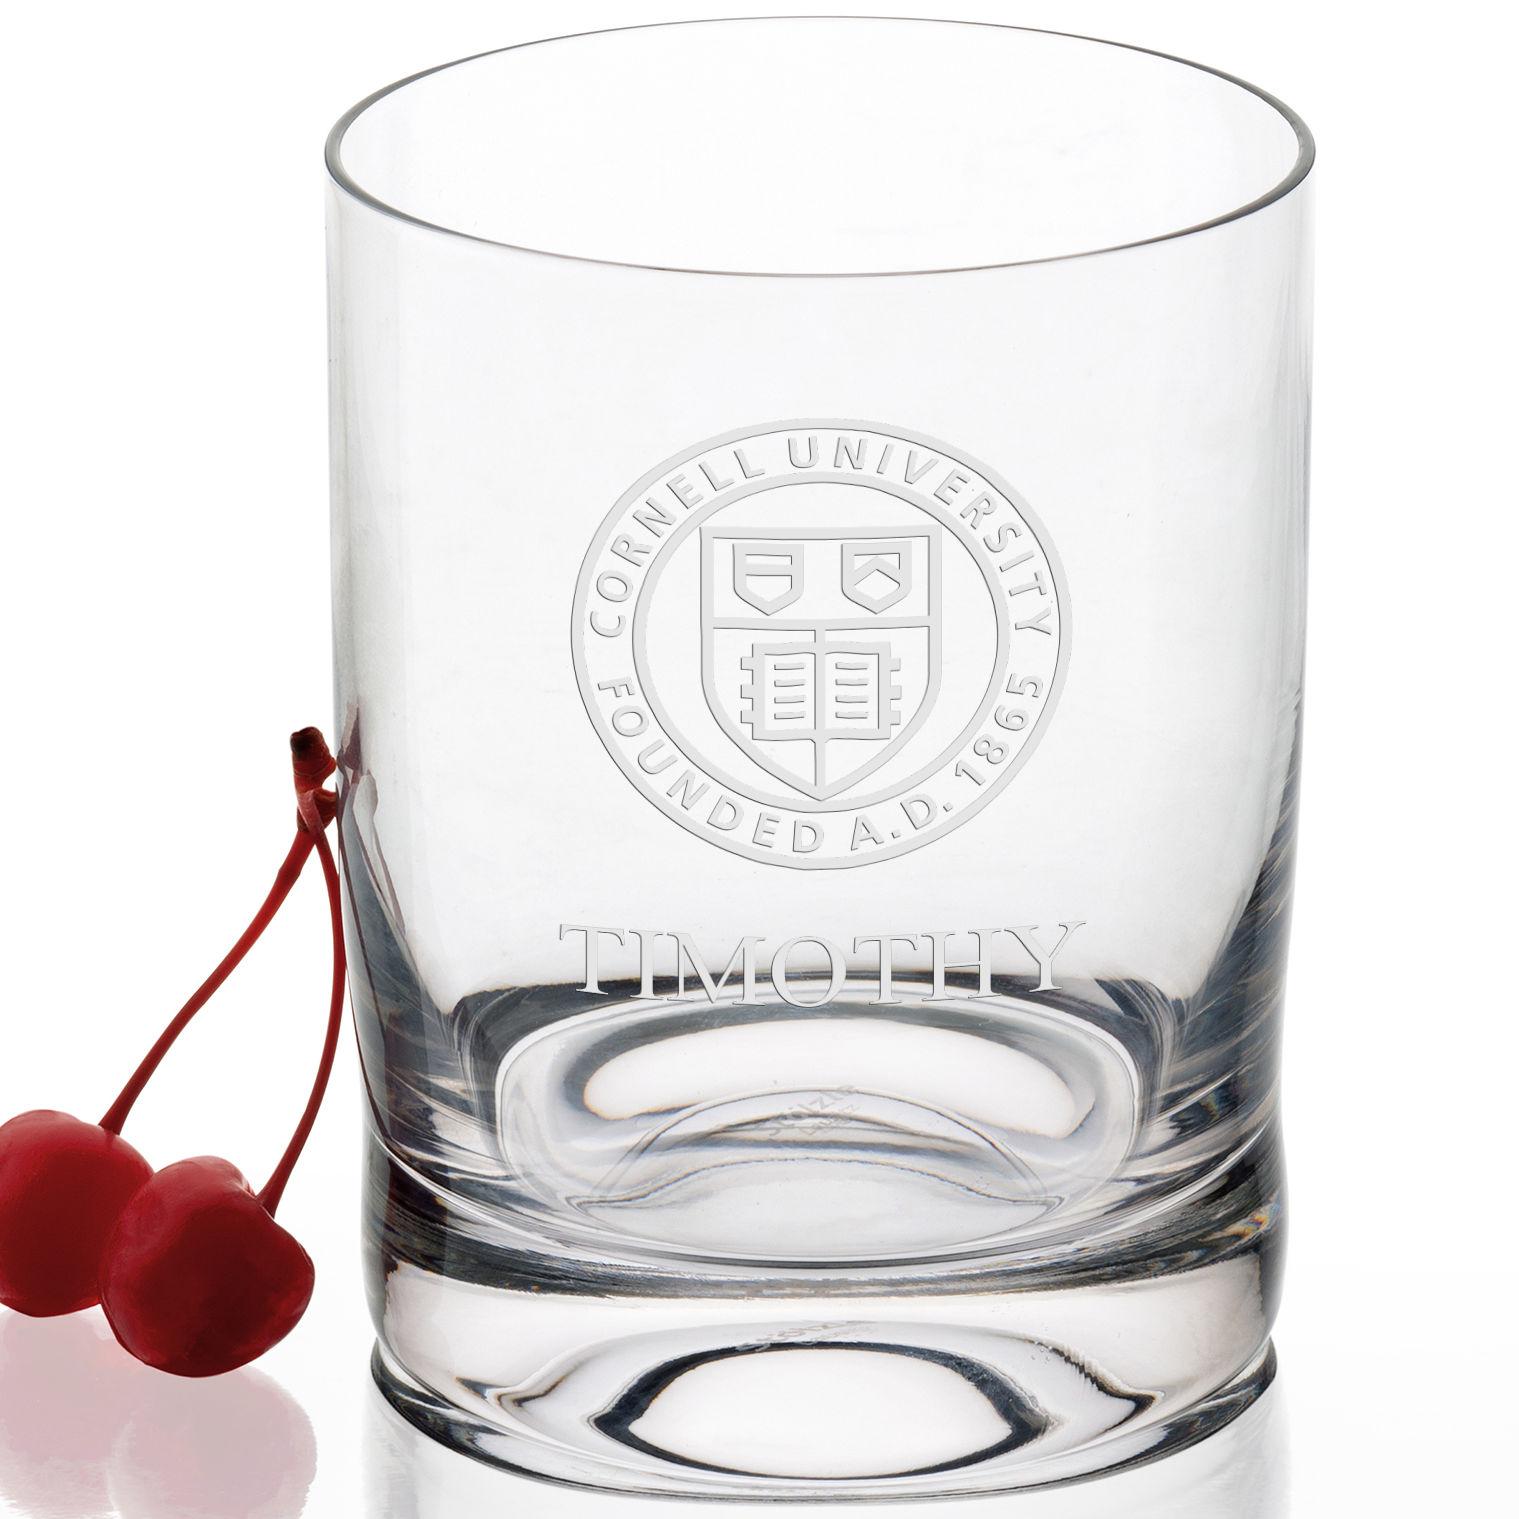 Cornell University Tumbler Glasses - Set of 2 - Image 2